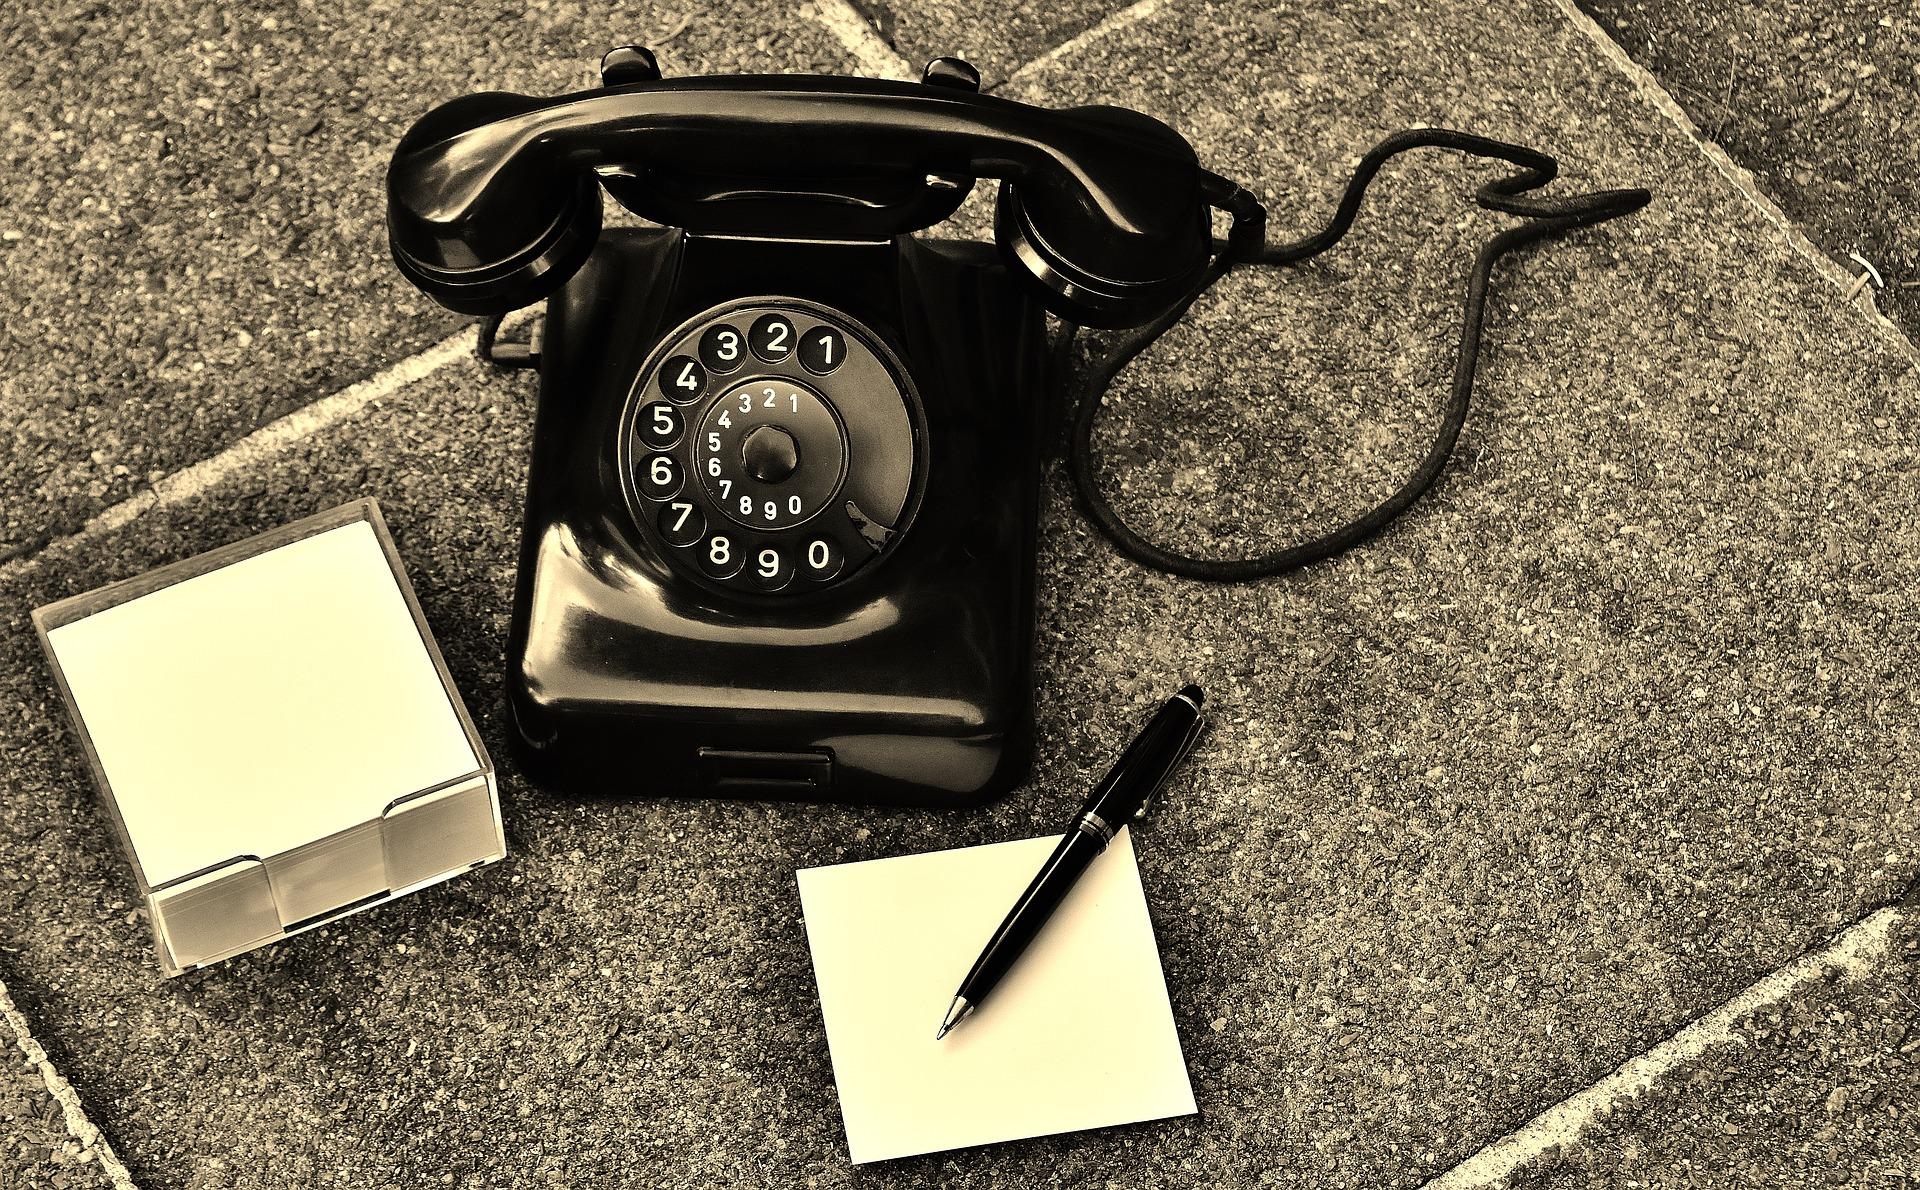 phone-1742841_1920.jpg